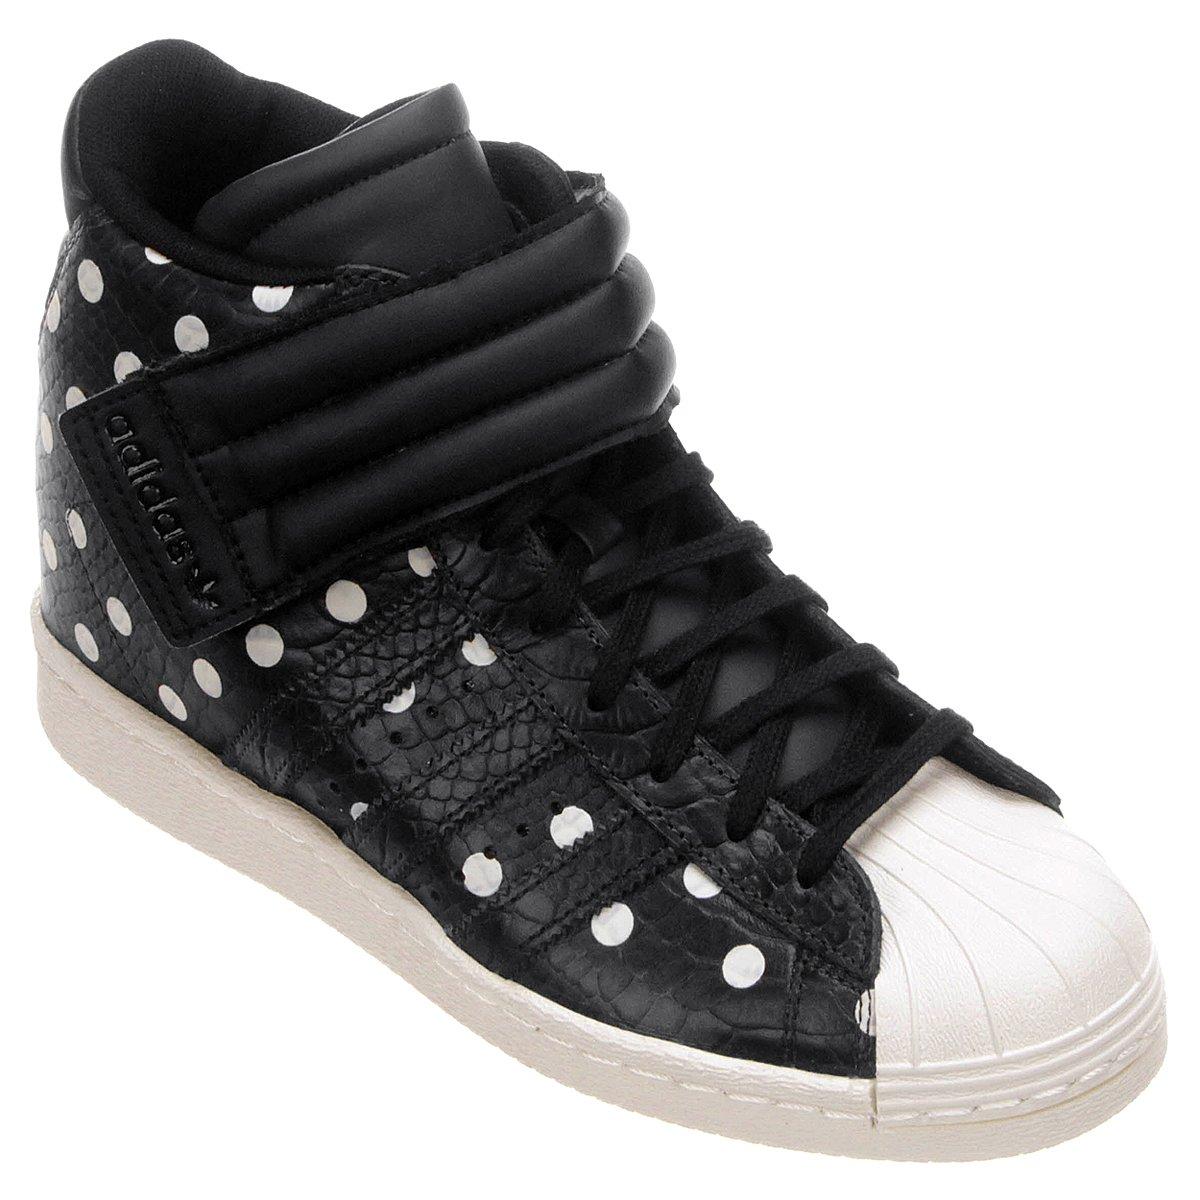 Adidas Superstar Up Strap | Superstar.shoes